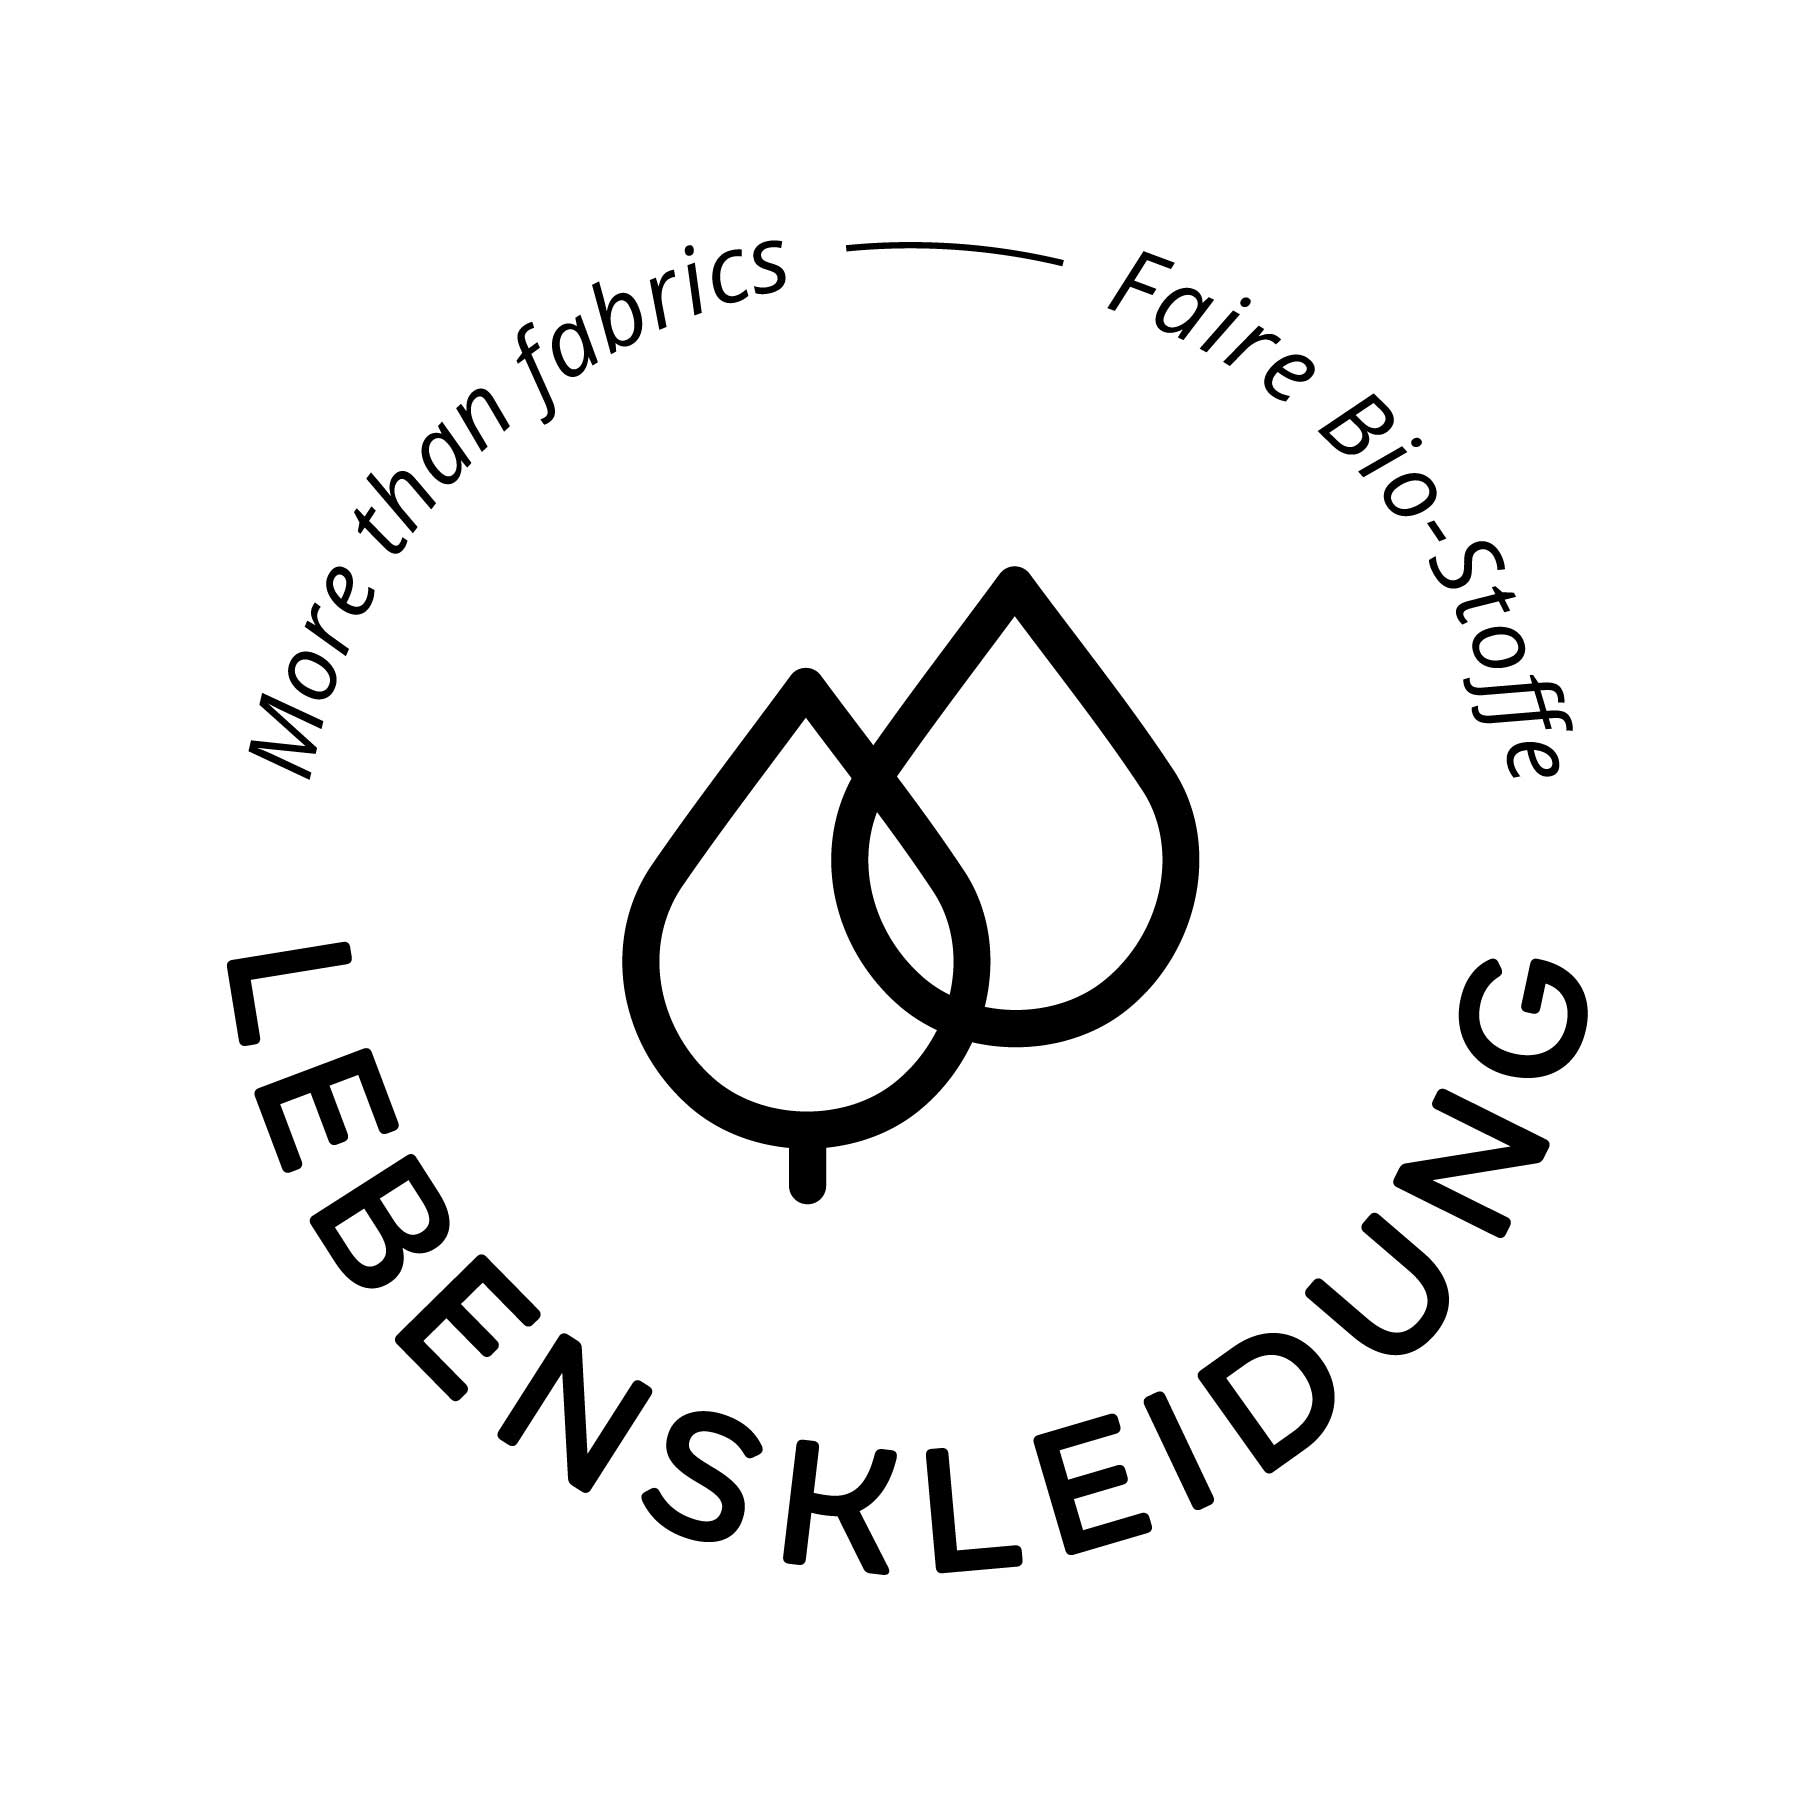 Tela orgánica RIB 2x1 (Puños) - Nude moteado canoso-1